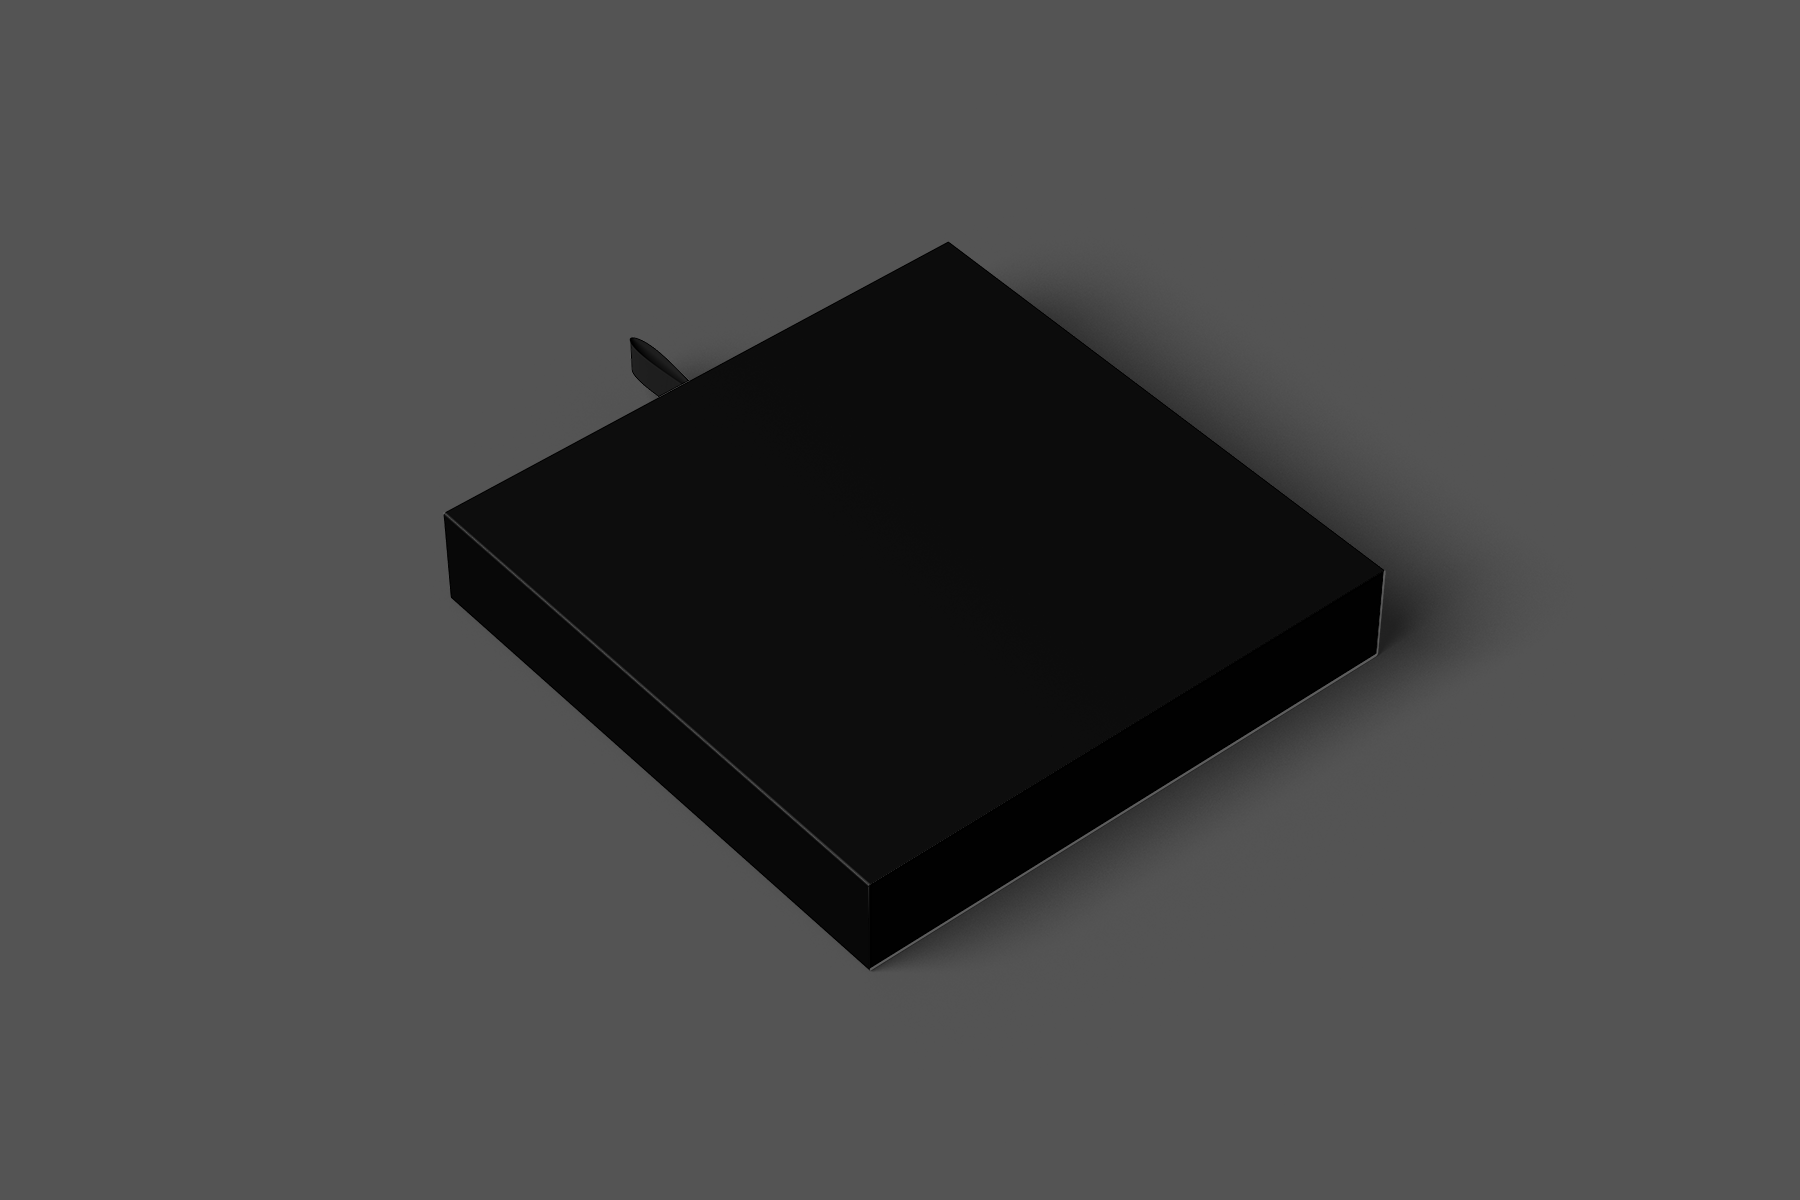 Free Flat Square Box Mockup